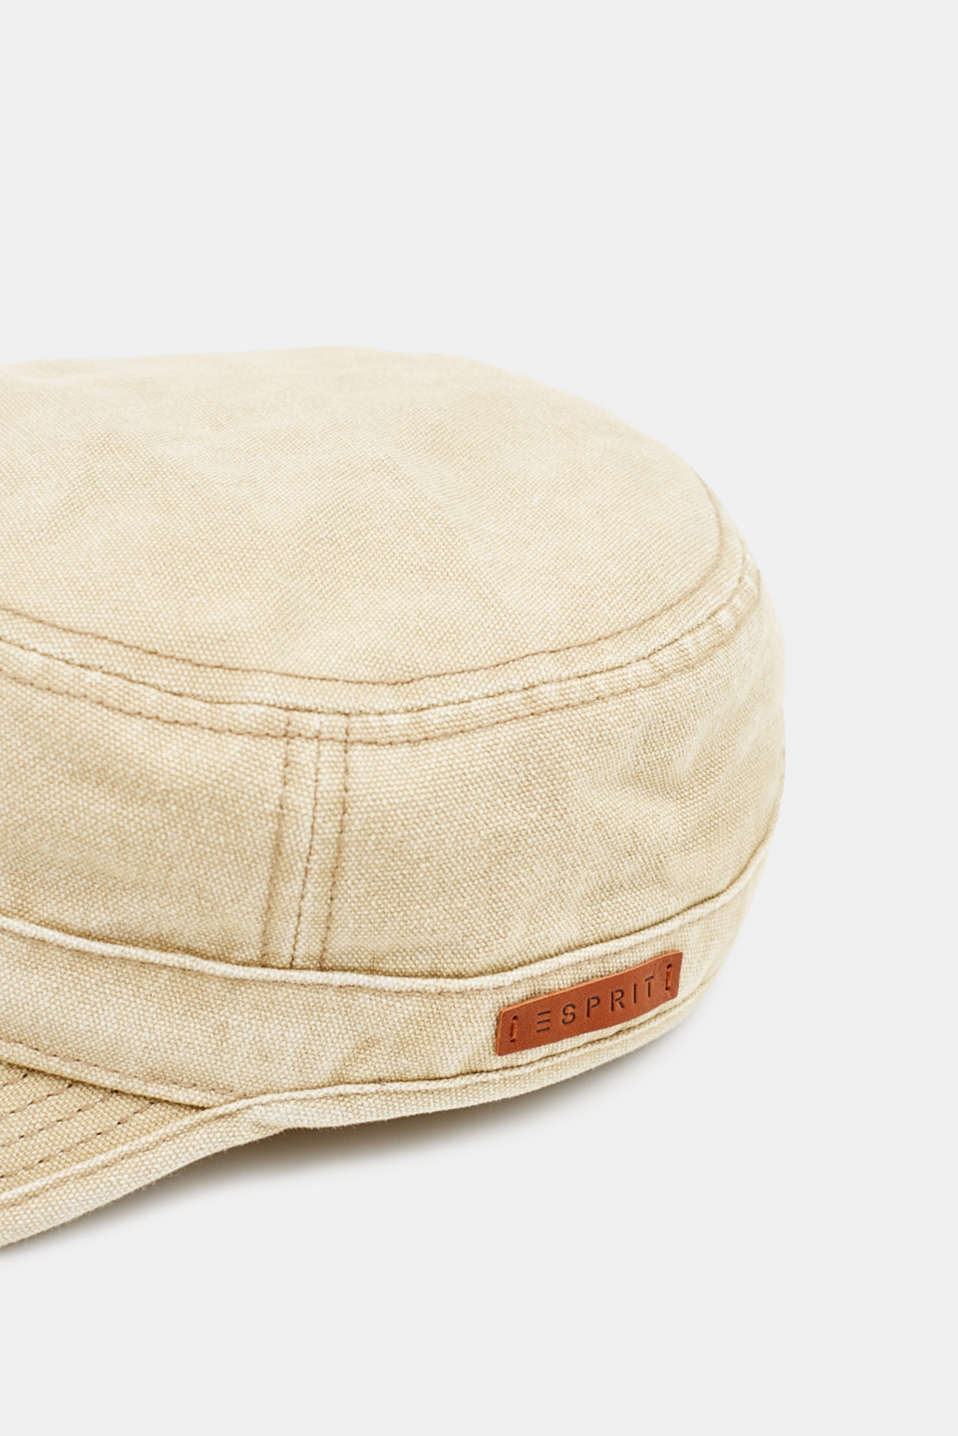 100% cotton cap, BEIGE, detail image number 1